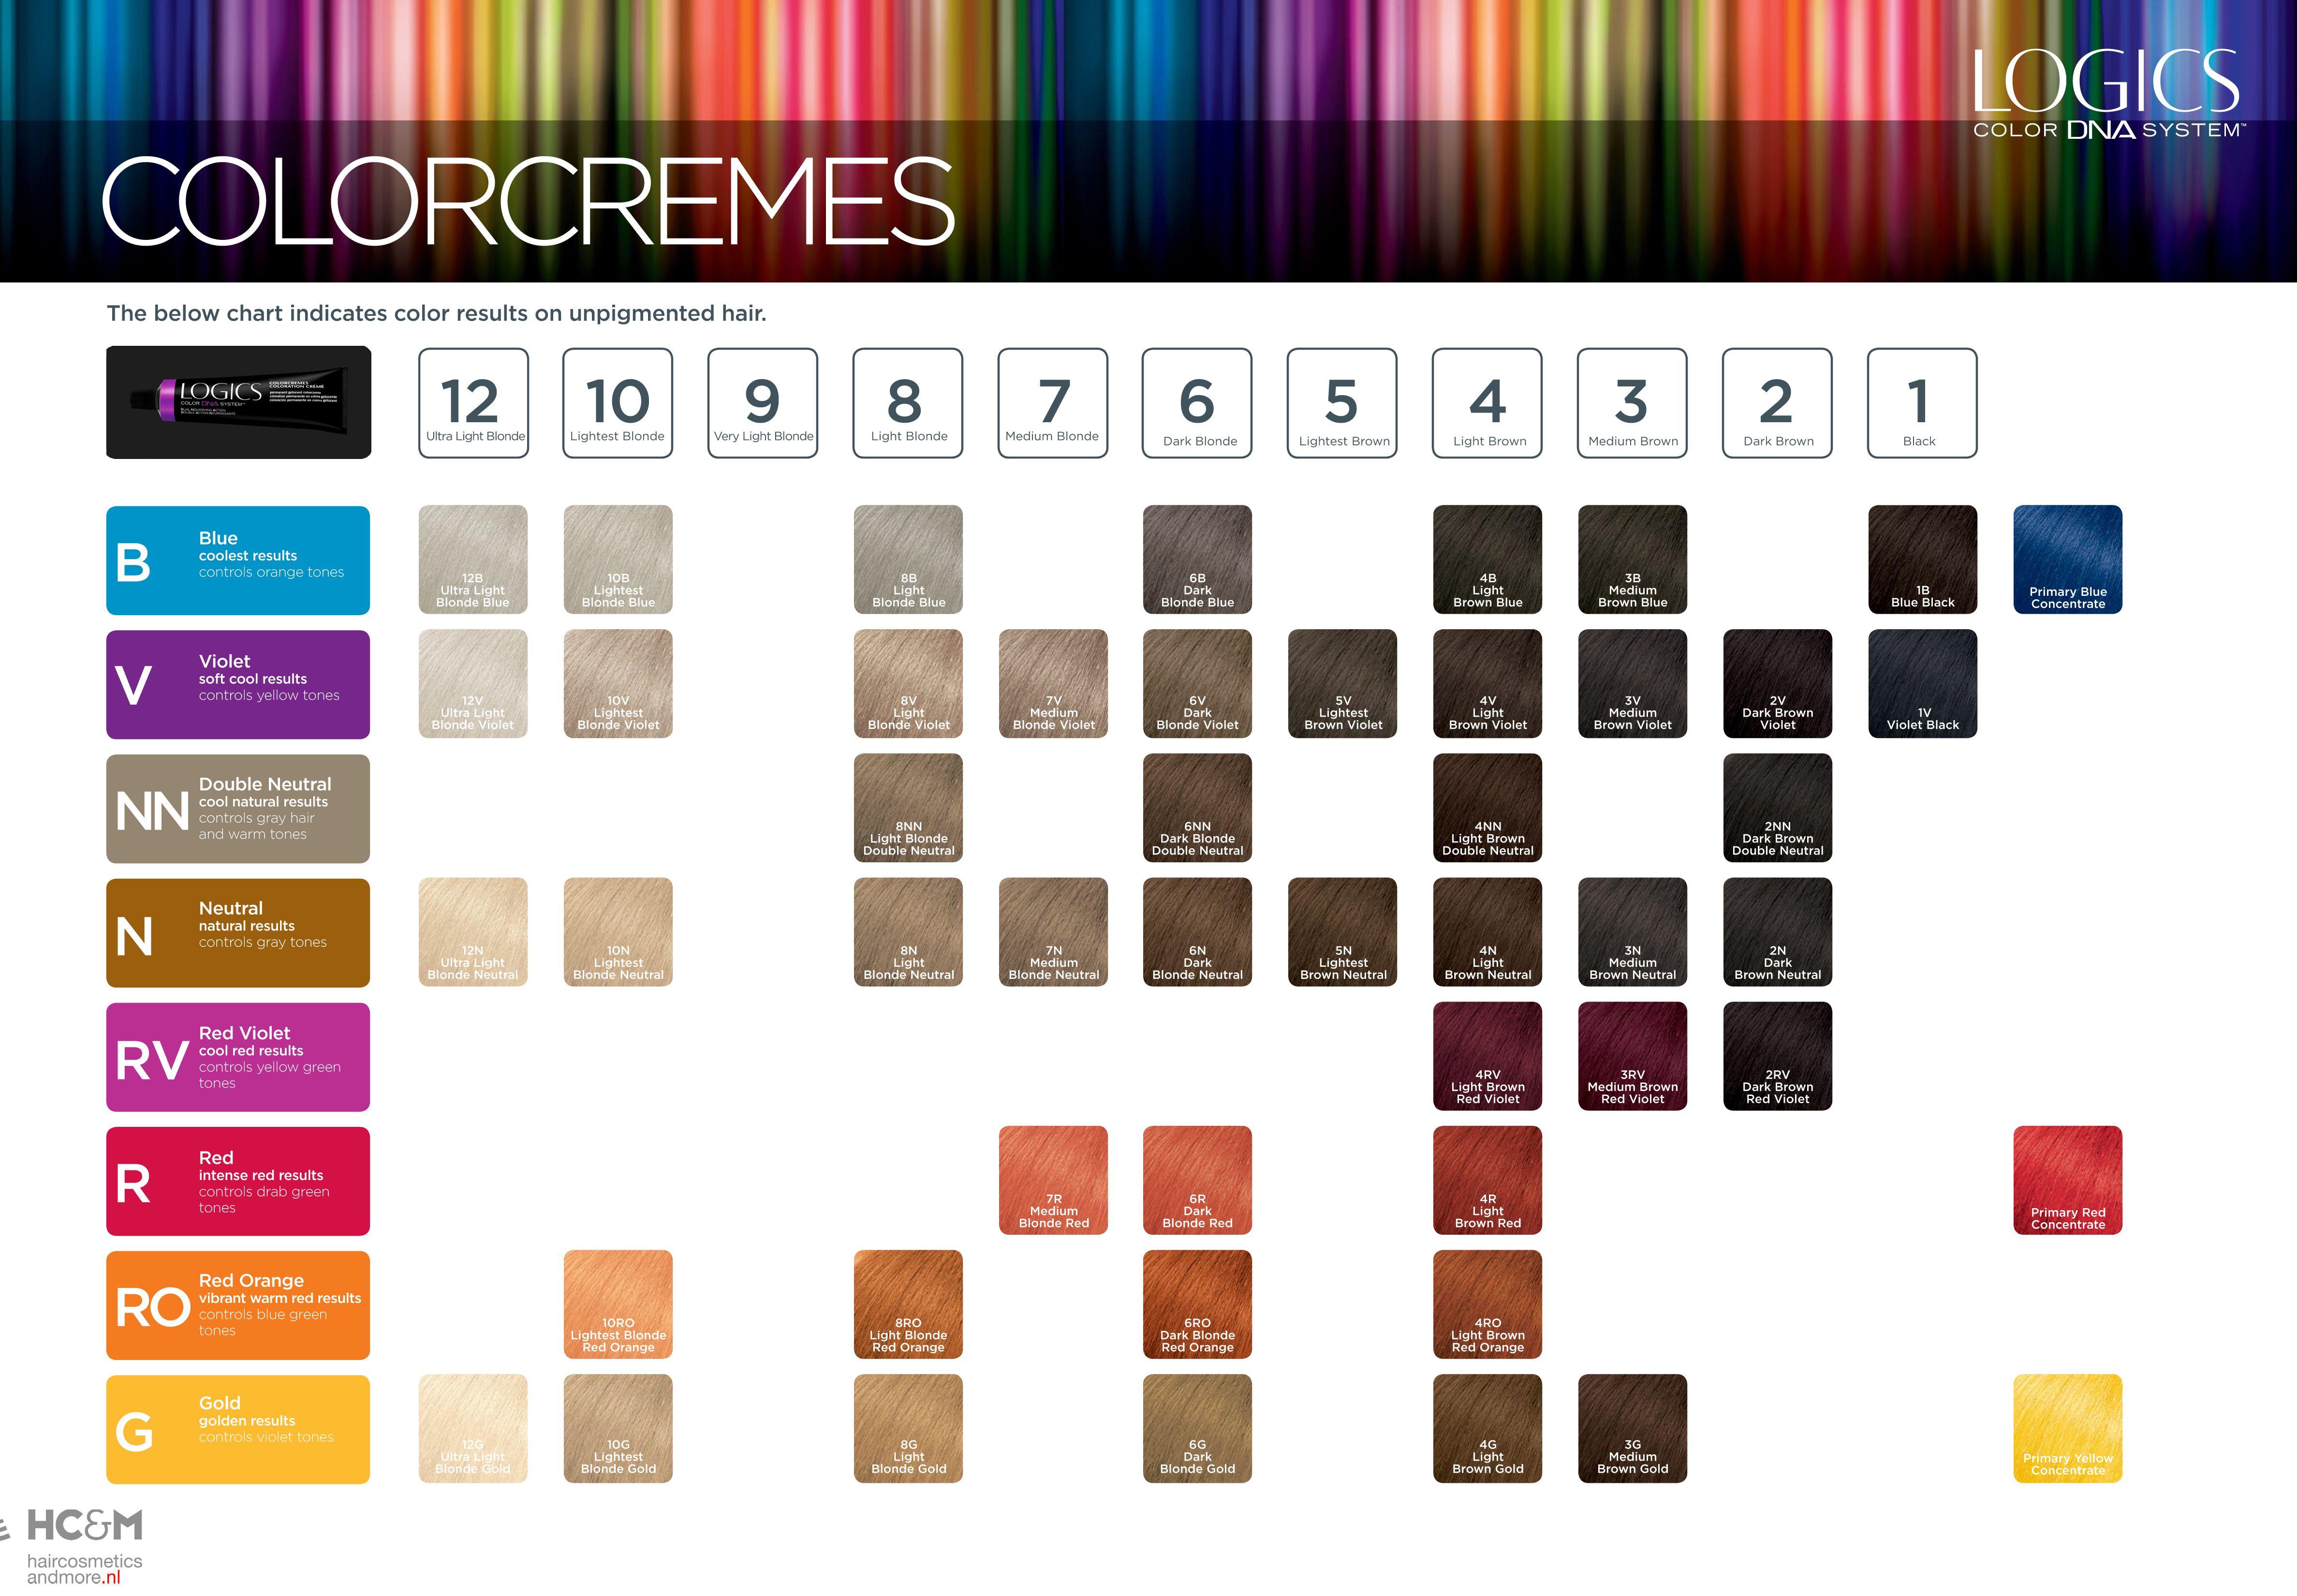 Logics Color Dna System Colorcremes Shades Palette 2 Hair